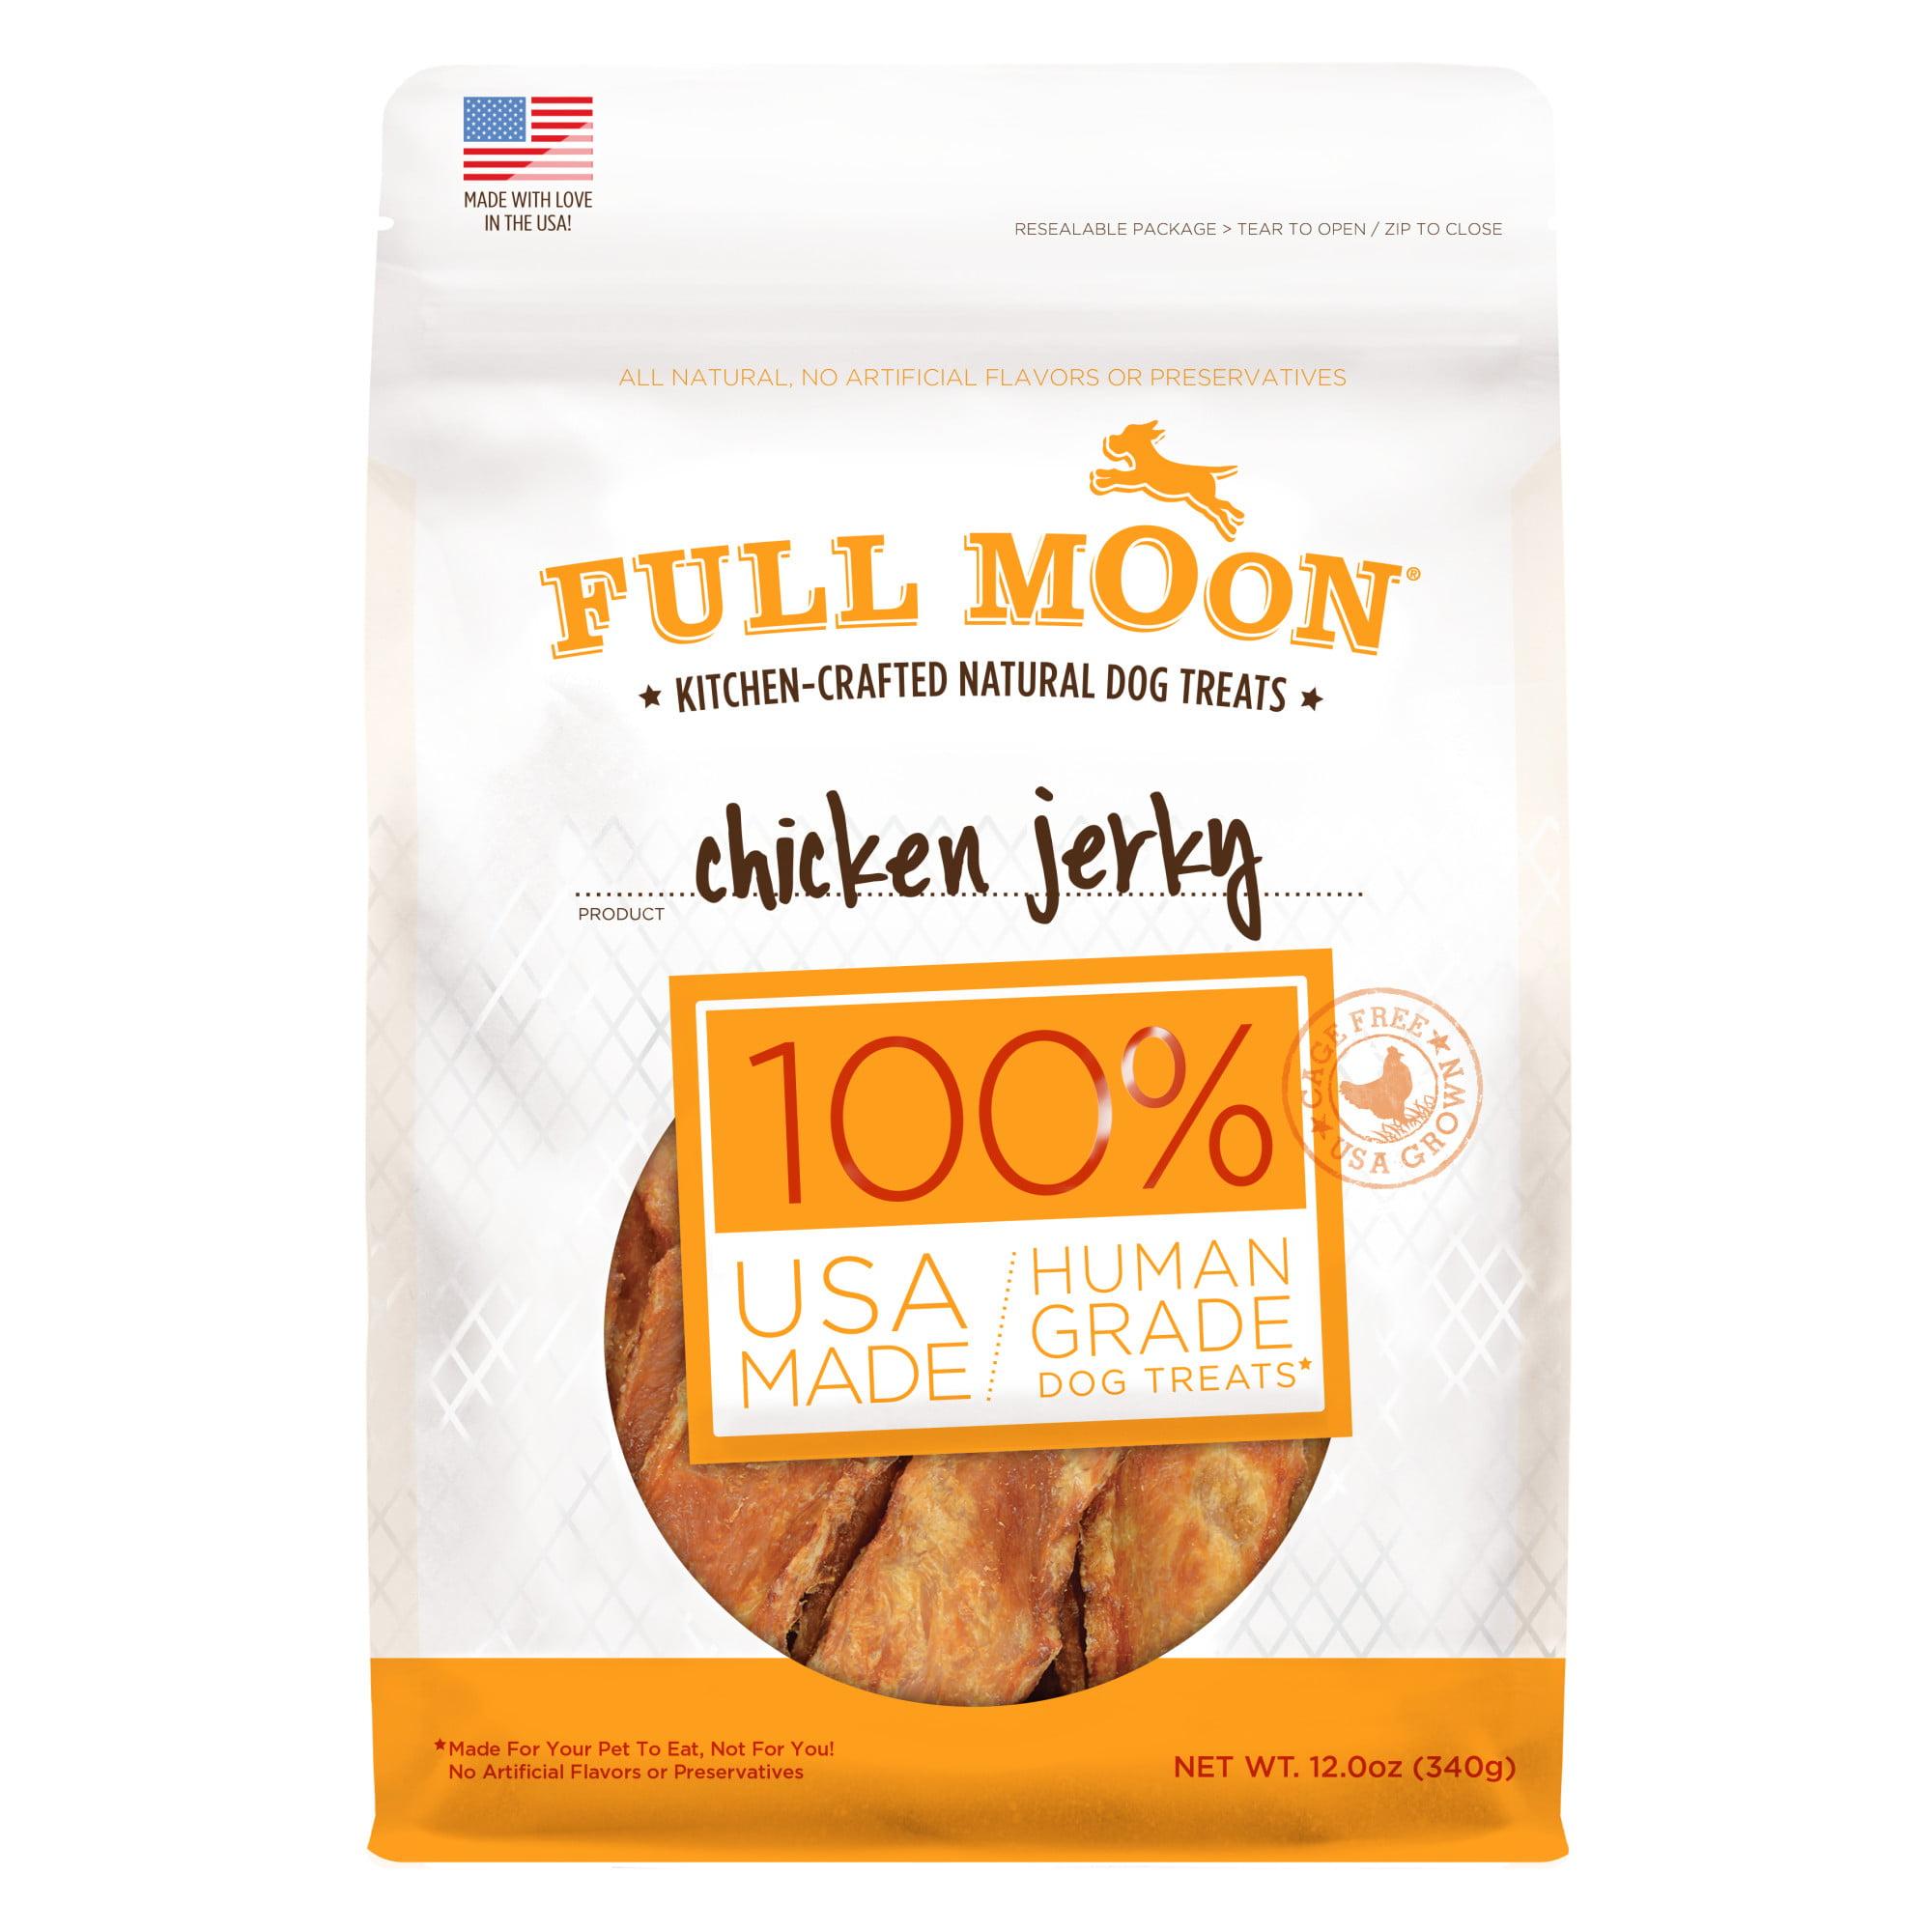 Full Moon All Natural Human Grade Dog Treats, Chicken Jerky, 12 Ounce by Perdue Foods, LLC